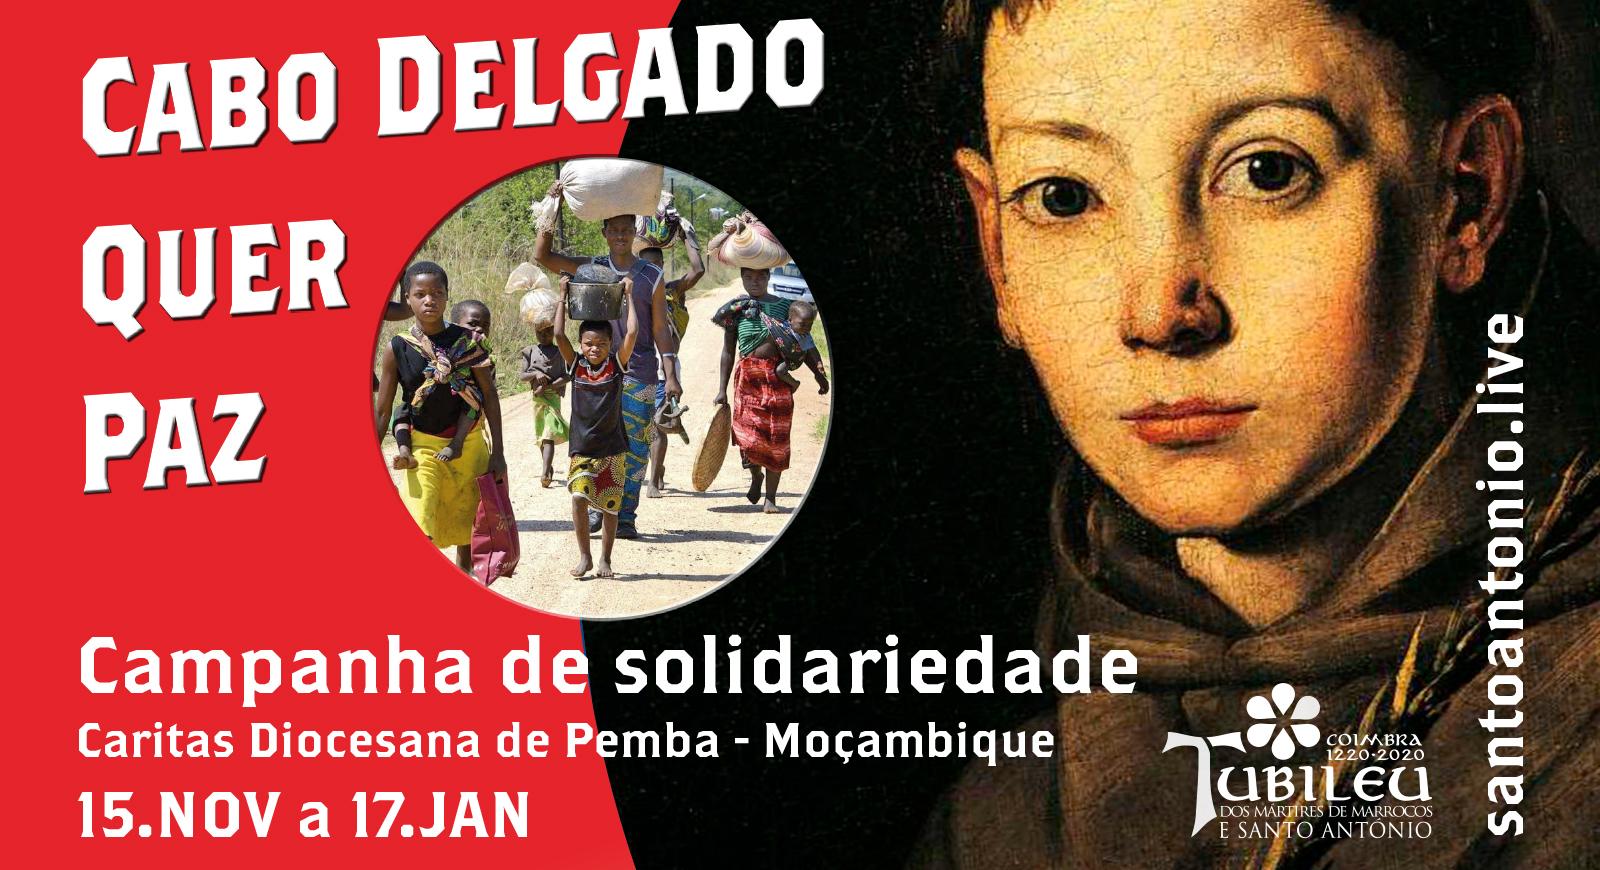 Campanha de solidariedade: Cabo Delgado Quer Paz Caritas Diocesana de Pemba, Moçambique.